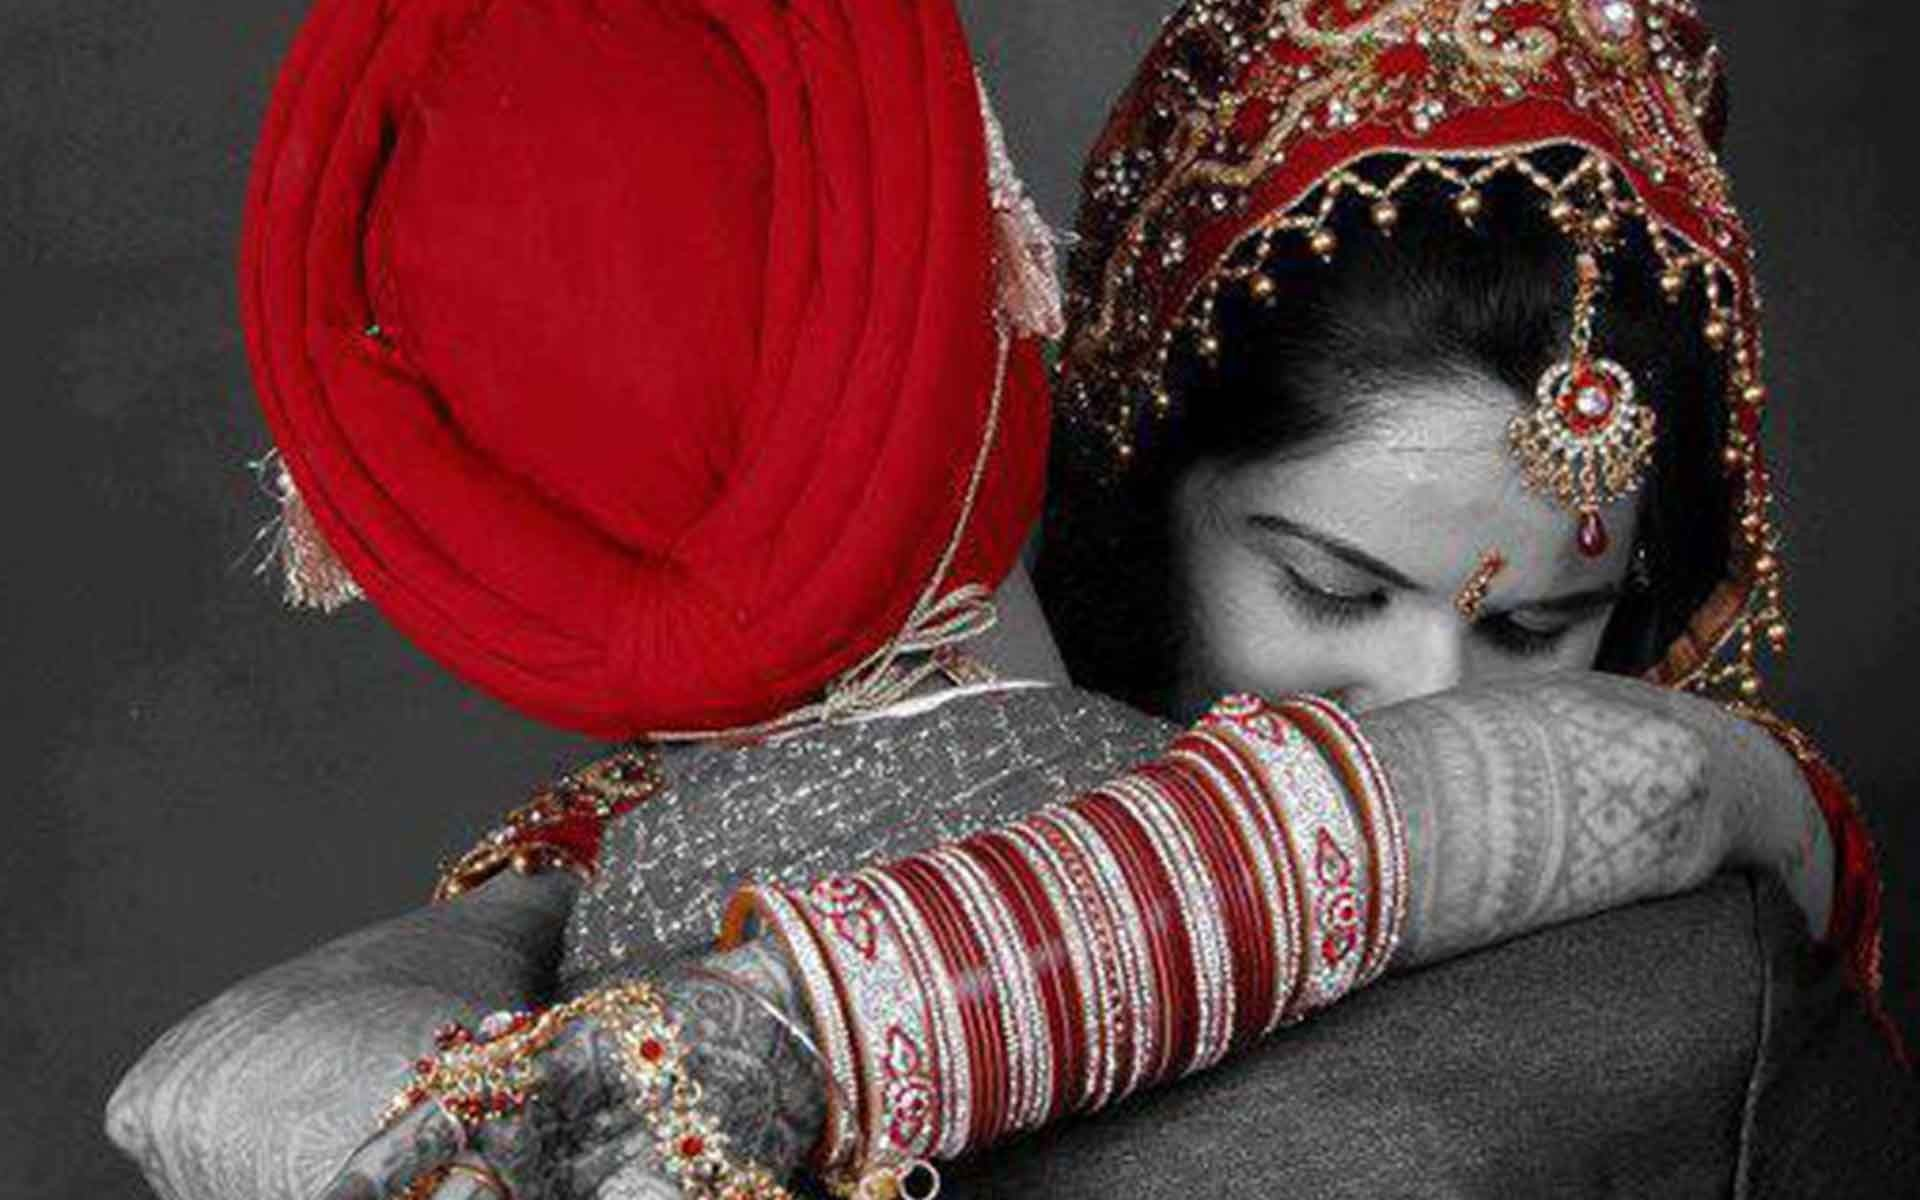 sweet punjabi wedding couple wallpaper couples pic punjabi hd 1920x1200 wallpaper teahub io teahub io